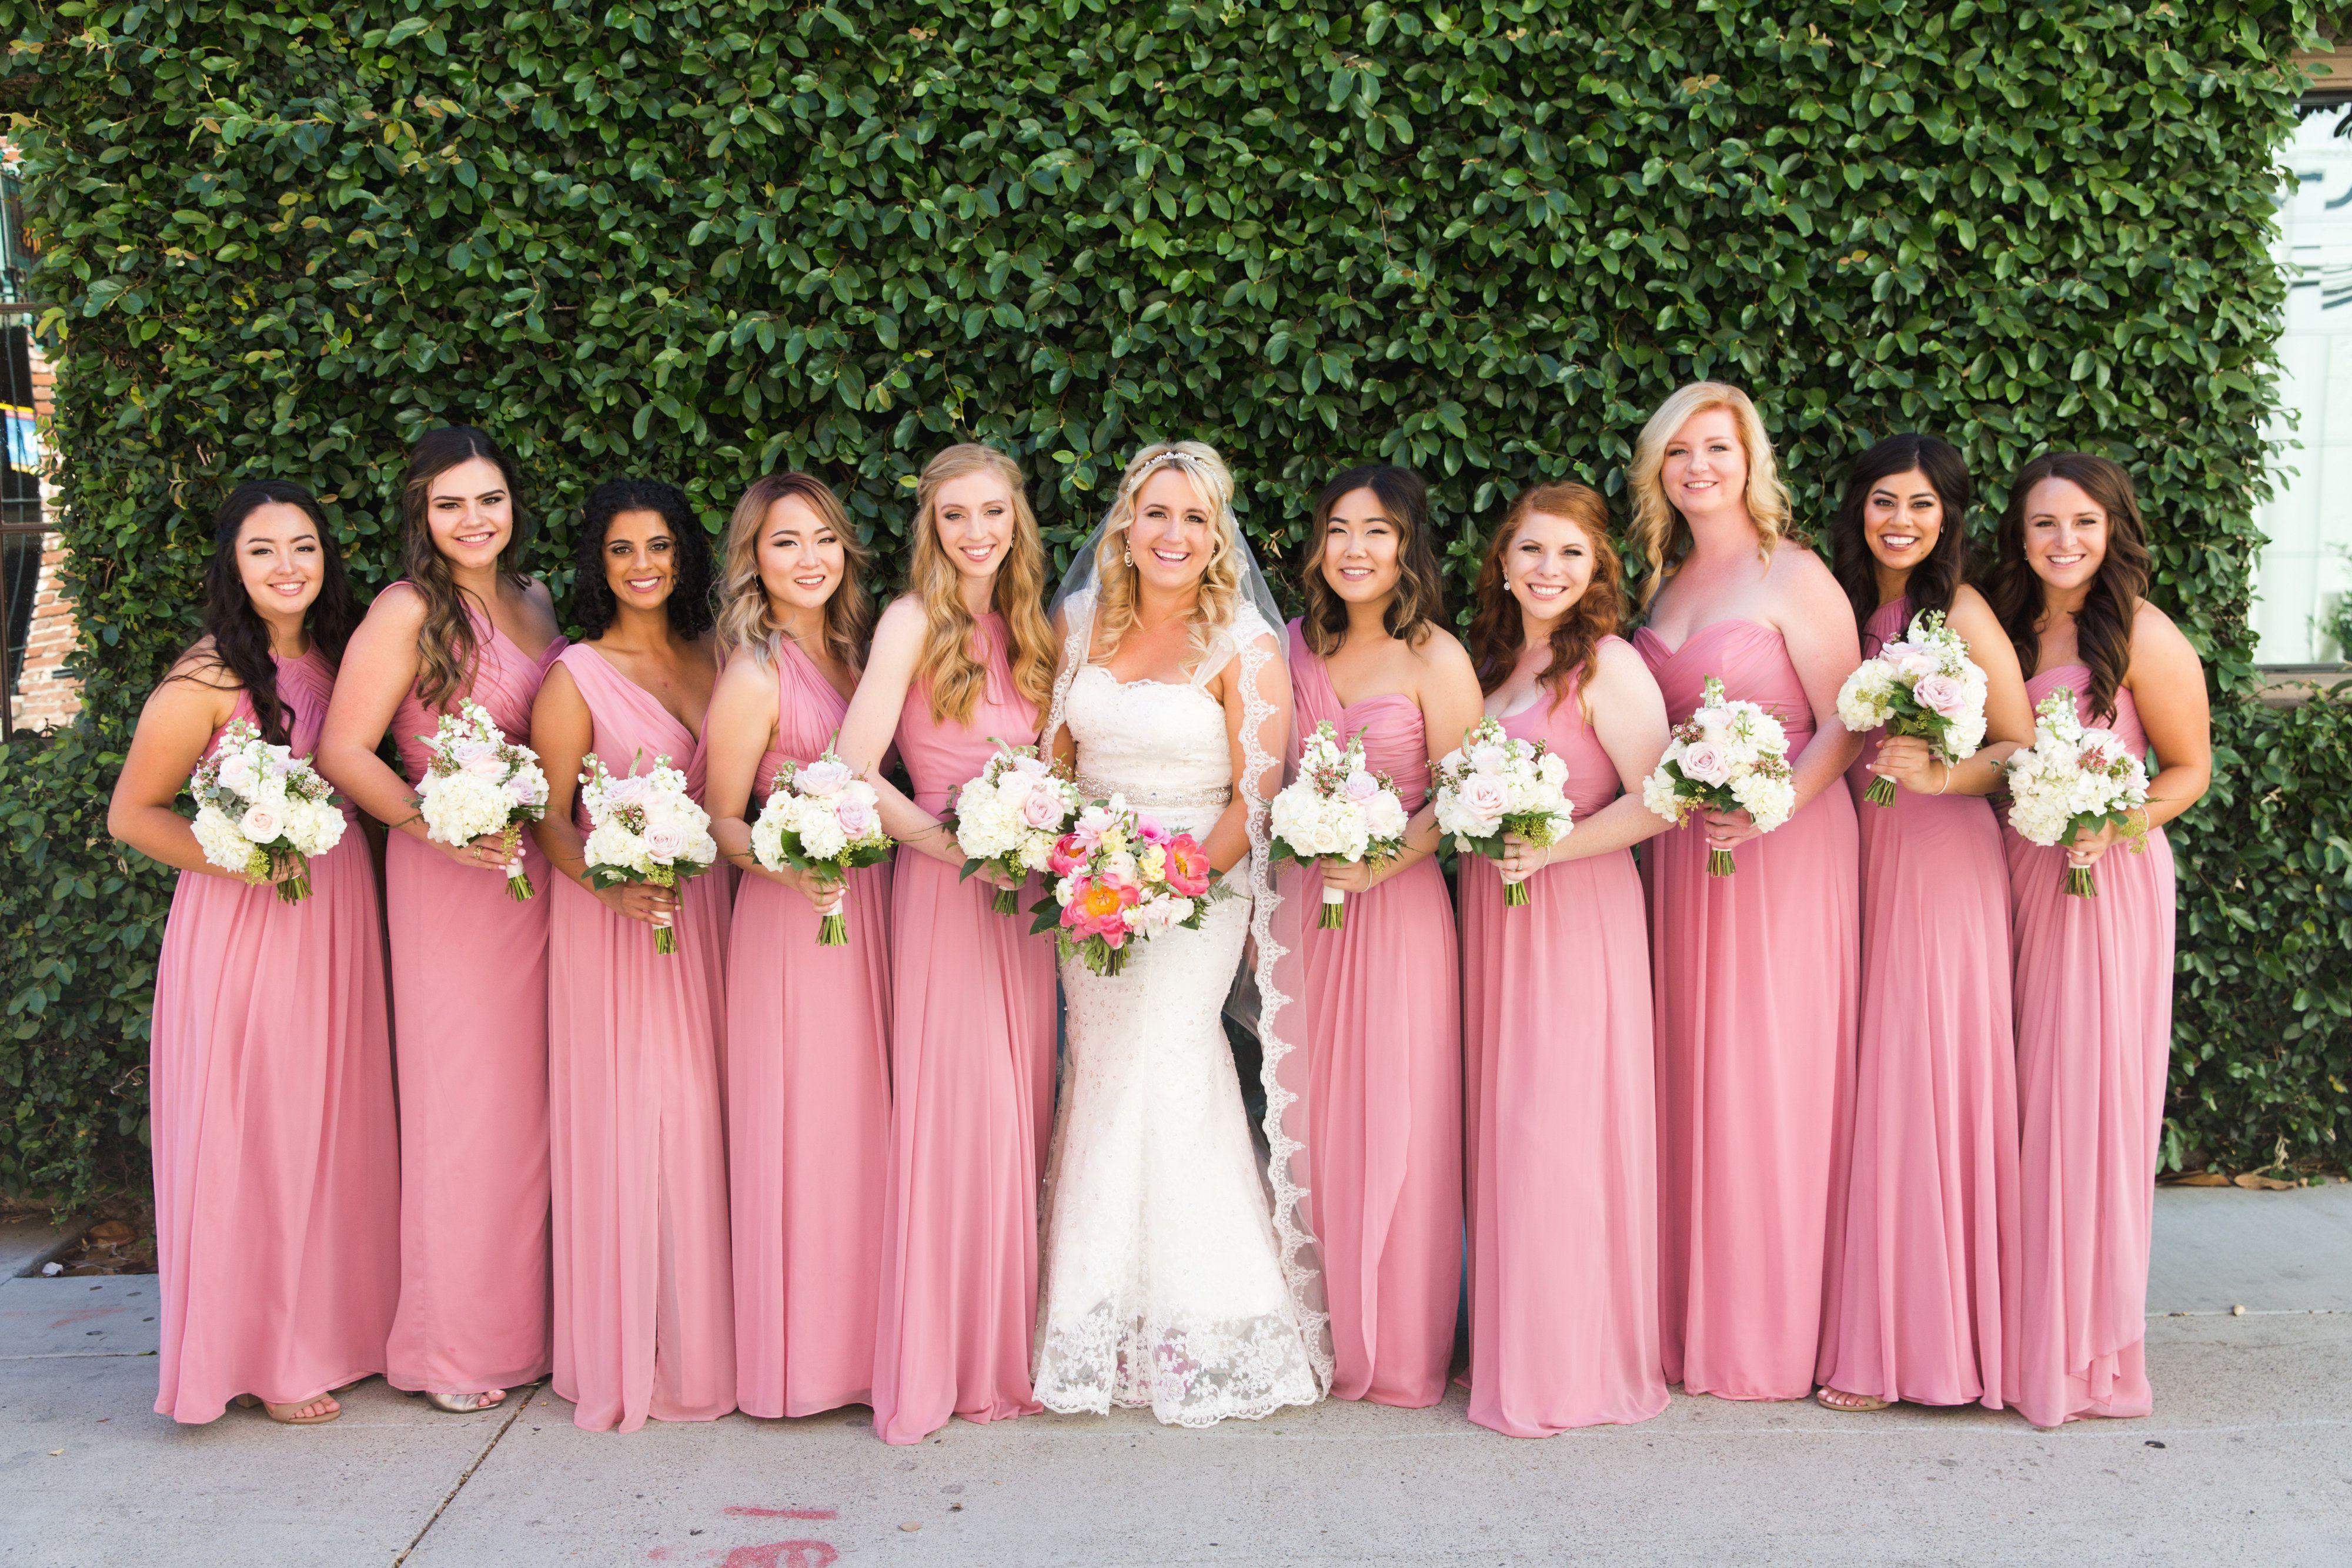 Dessy carnation bellabridesmaids bridesmaids dresses wedding dessy carnation bellabridesmaids bridesmaids dresses wedding ombrellifo Gallery